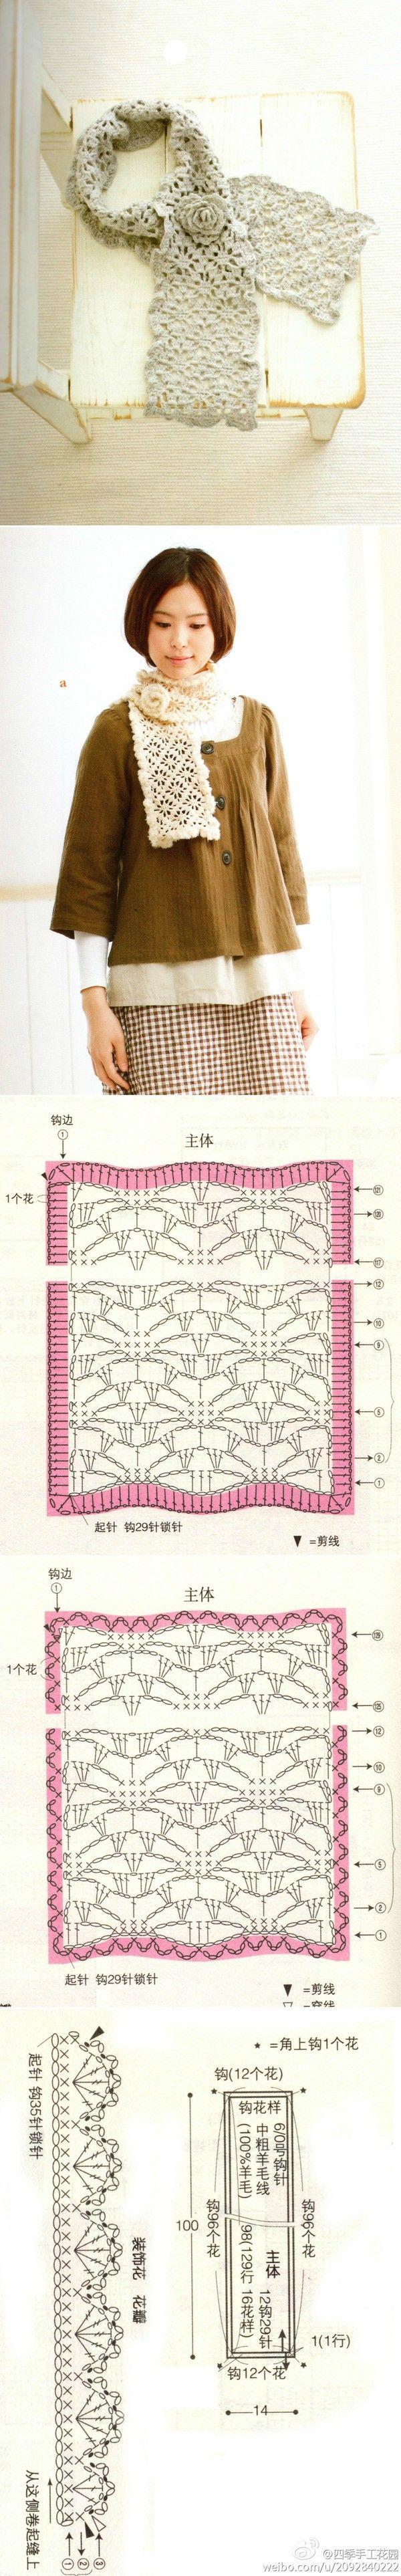 b-u-t-ful crochet lace scarf | Puntos a crochet | Pinterest | Tejido ...